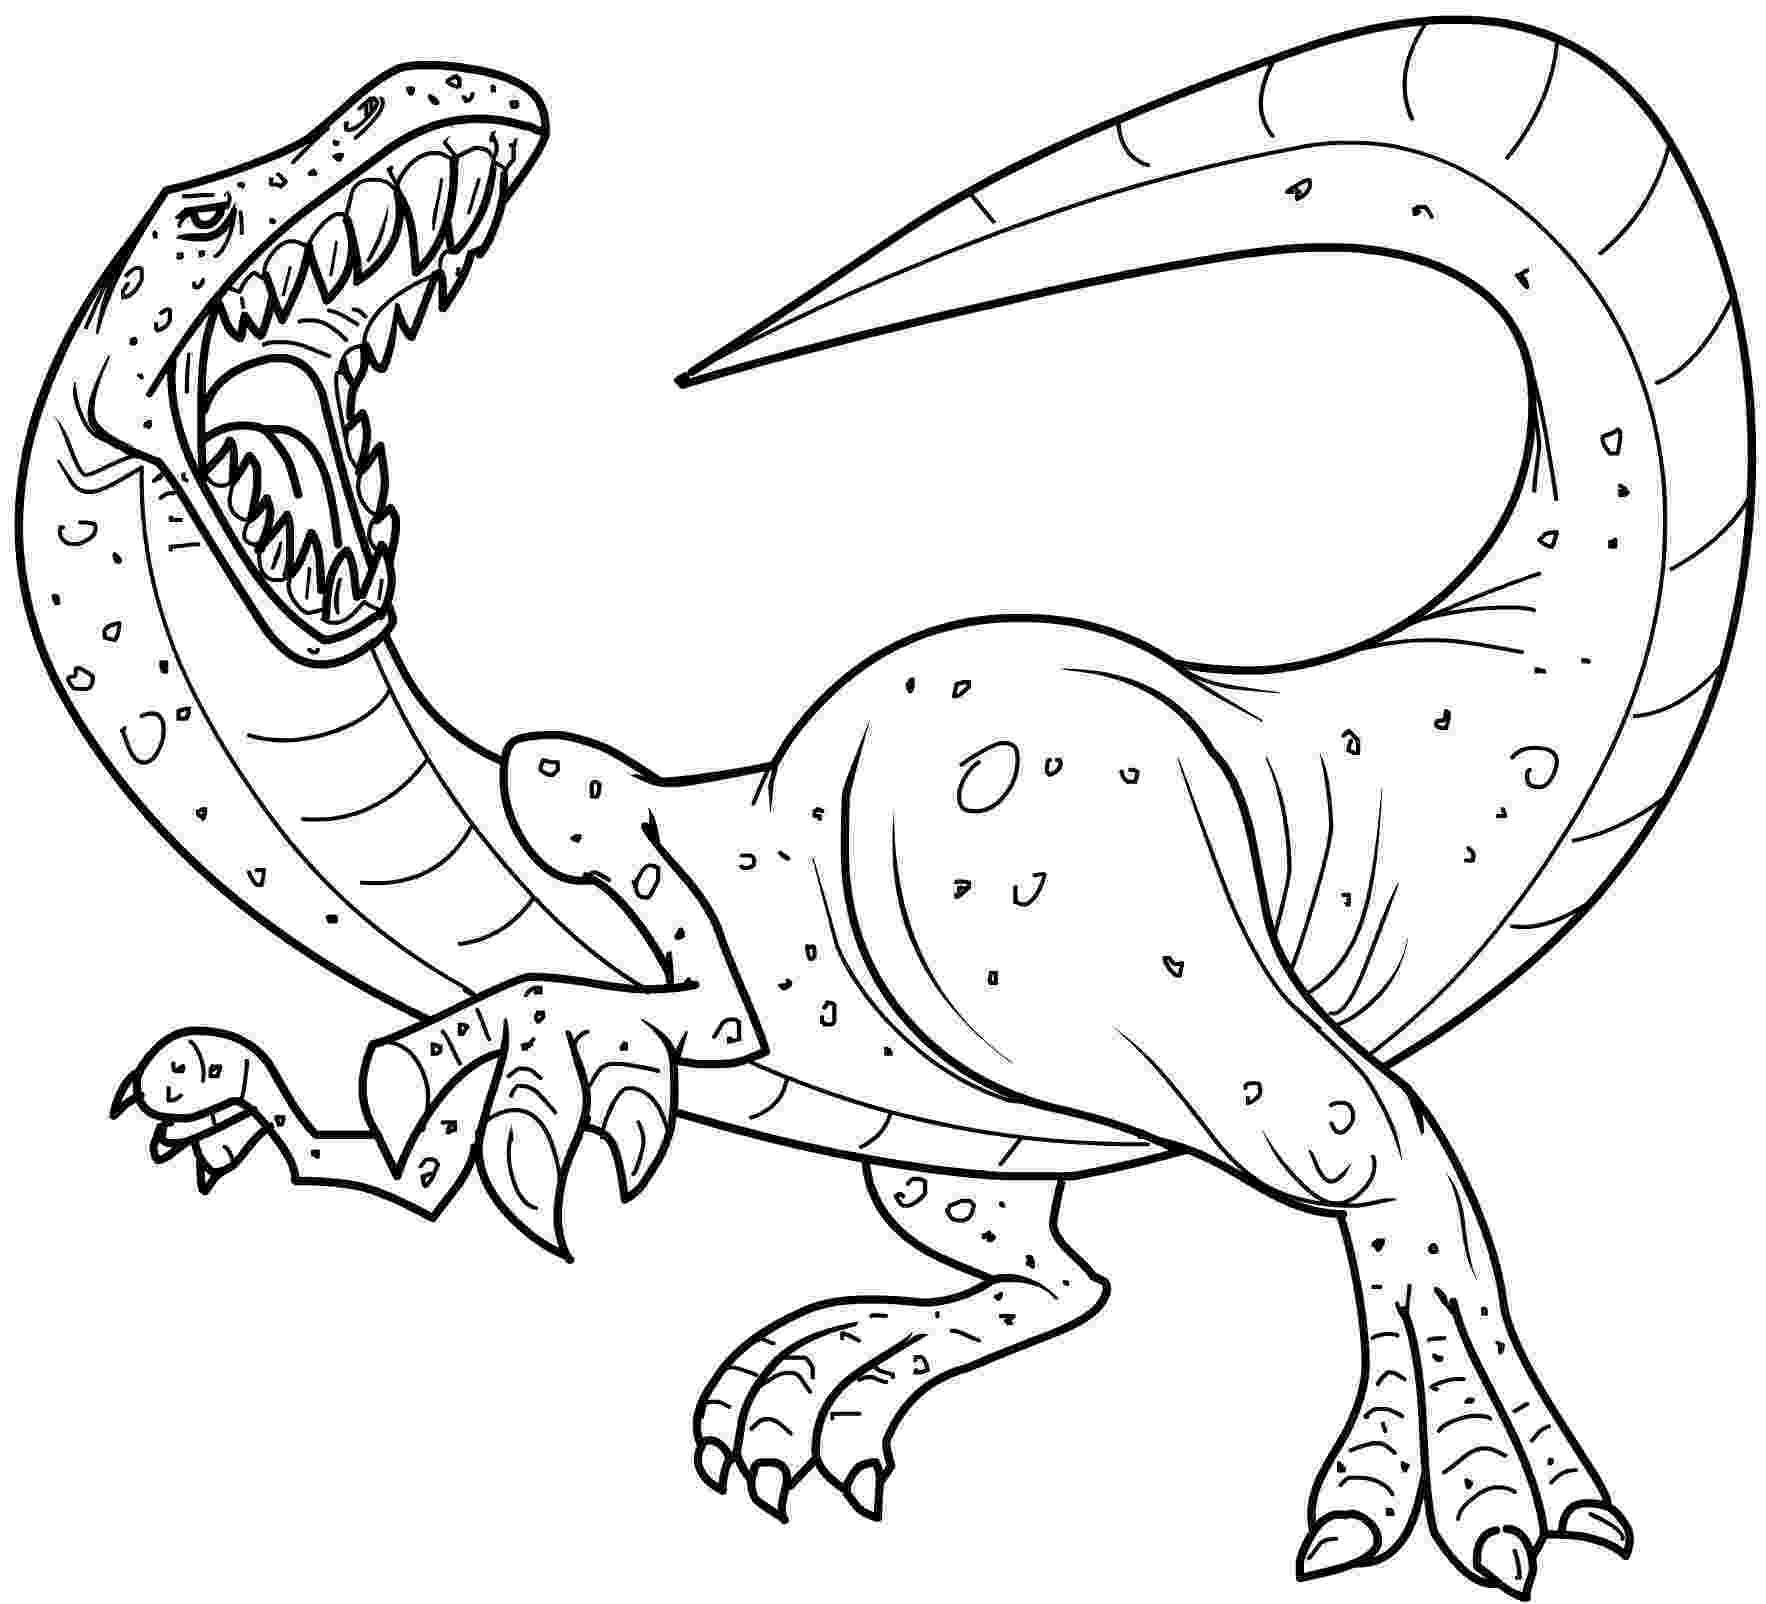 dinosuar coloring pages free printable dinosaur coloring pages for kids coloring dinosuar pages